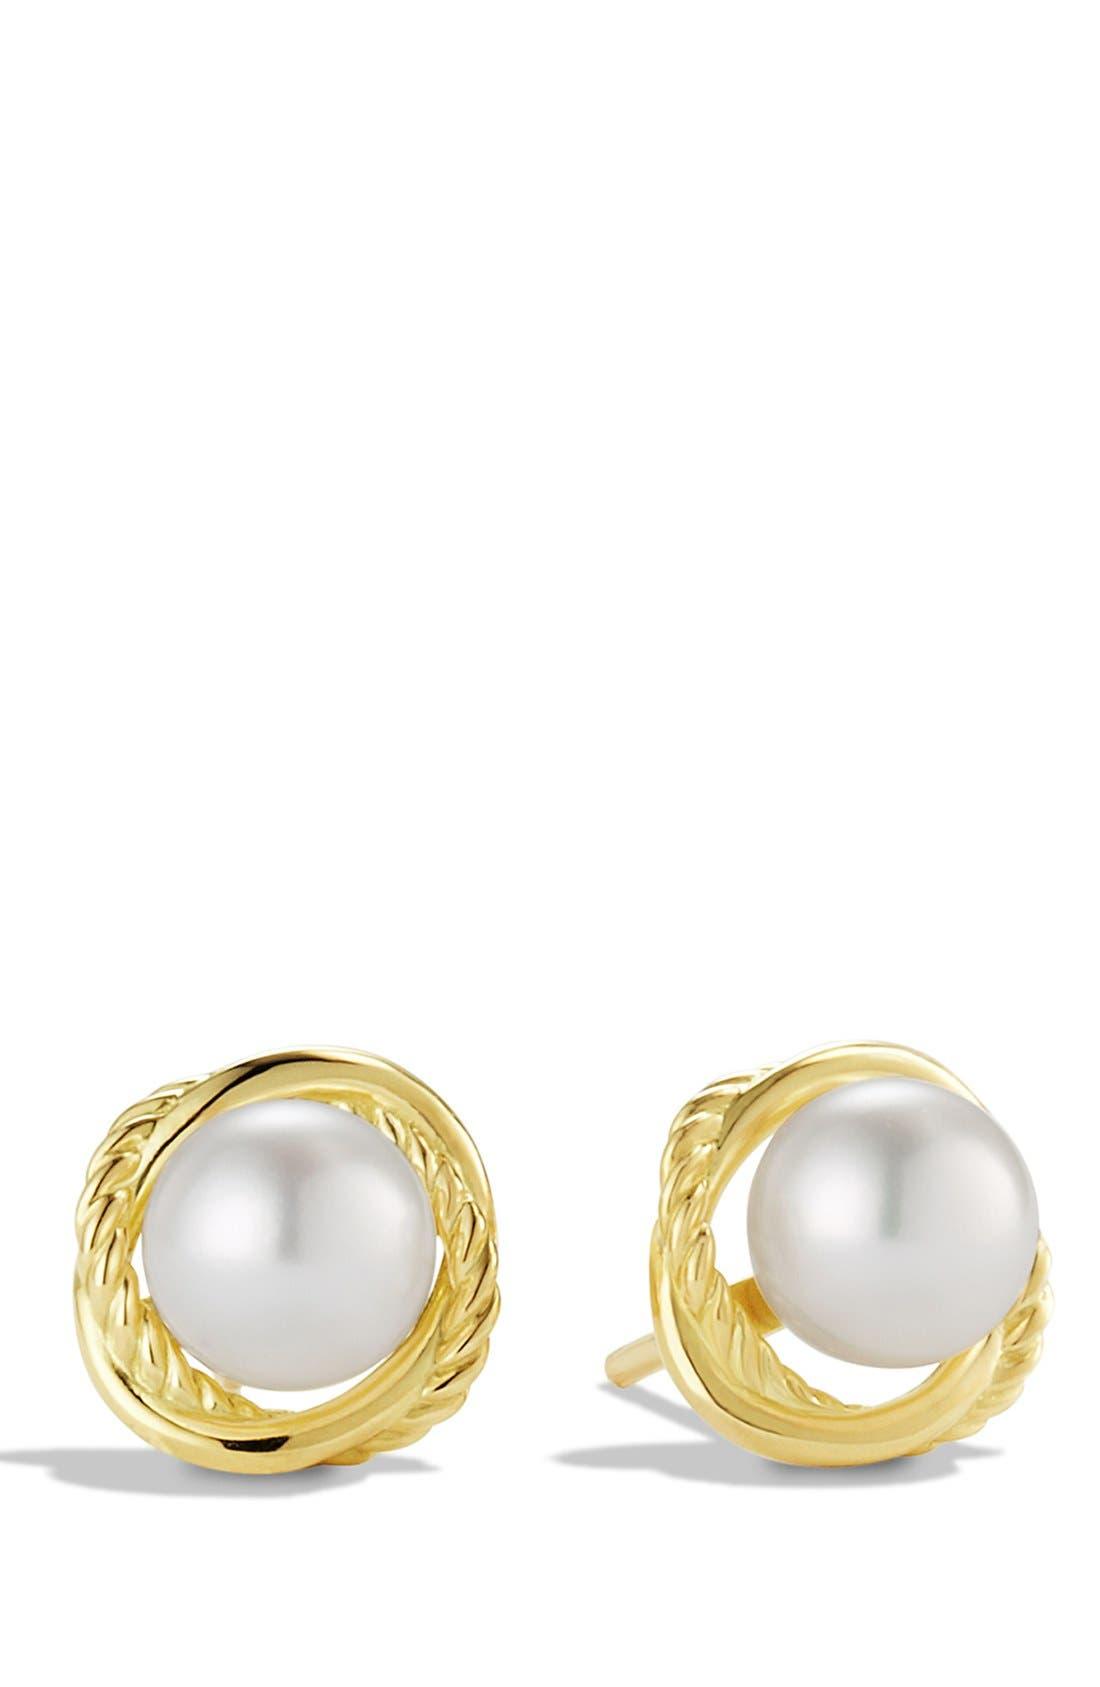 David Yurman 'Infinity' Earrings with Pearls in Gold